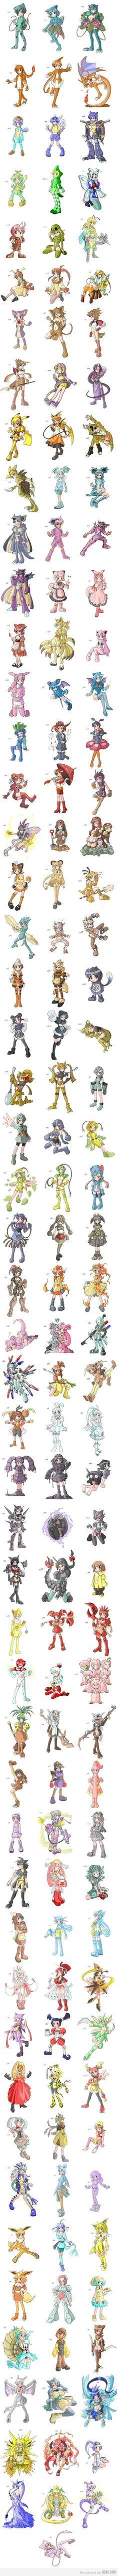 1st Generation Pokemon